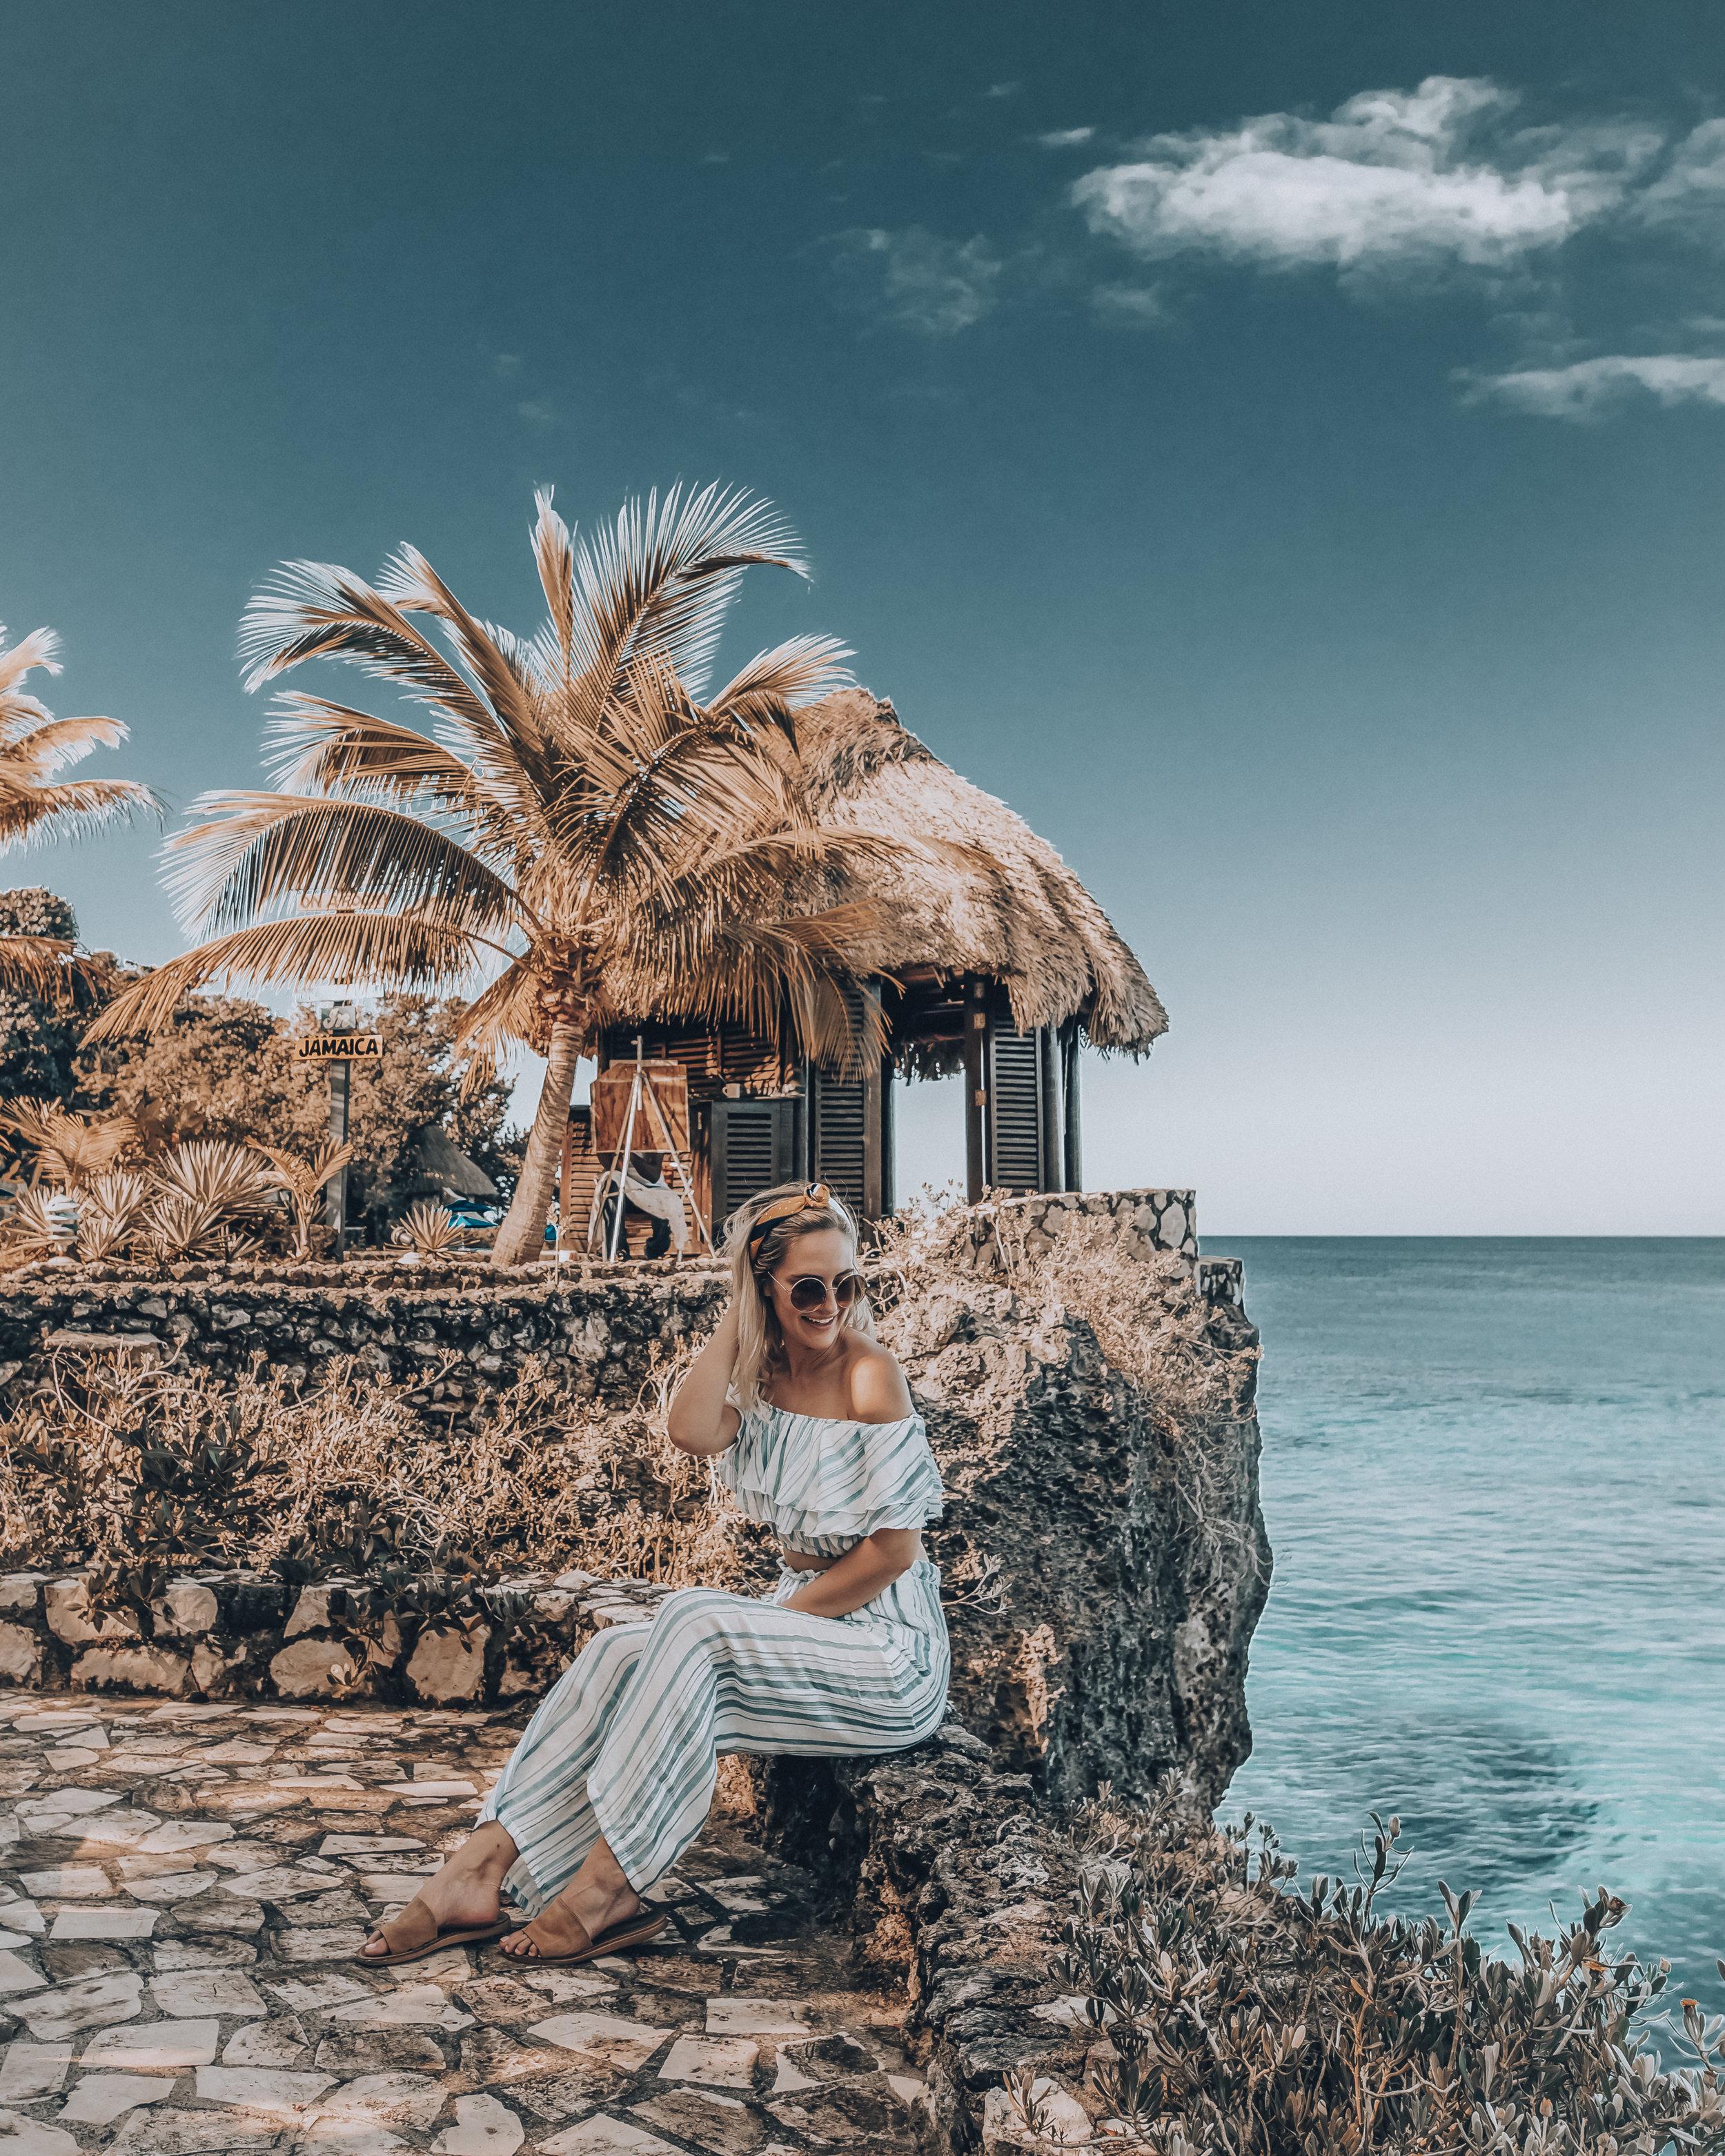 Rockhouse Jamaica